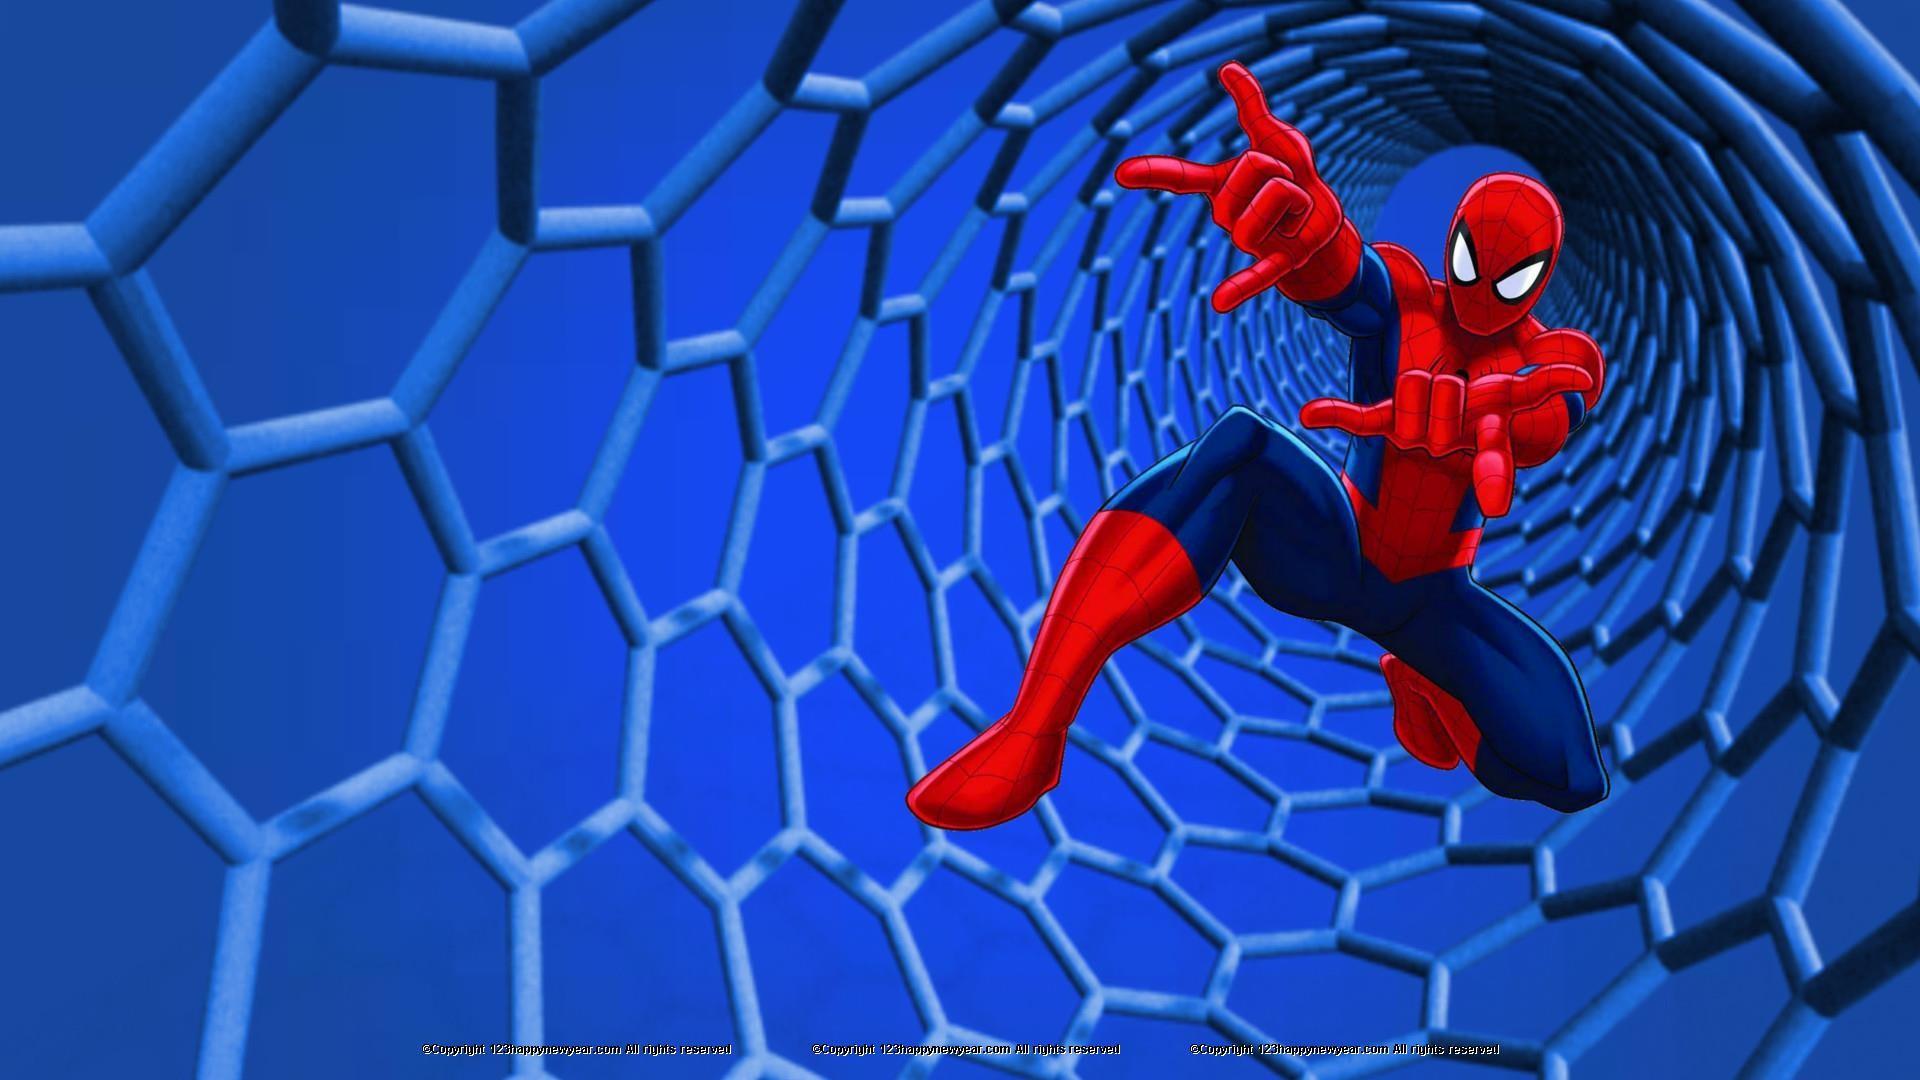 spiderman 3 wallpaper (67+ images)